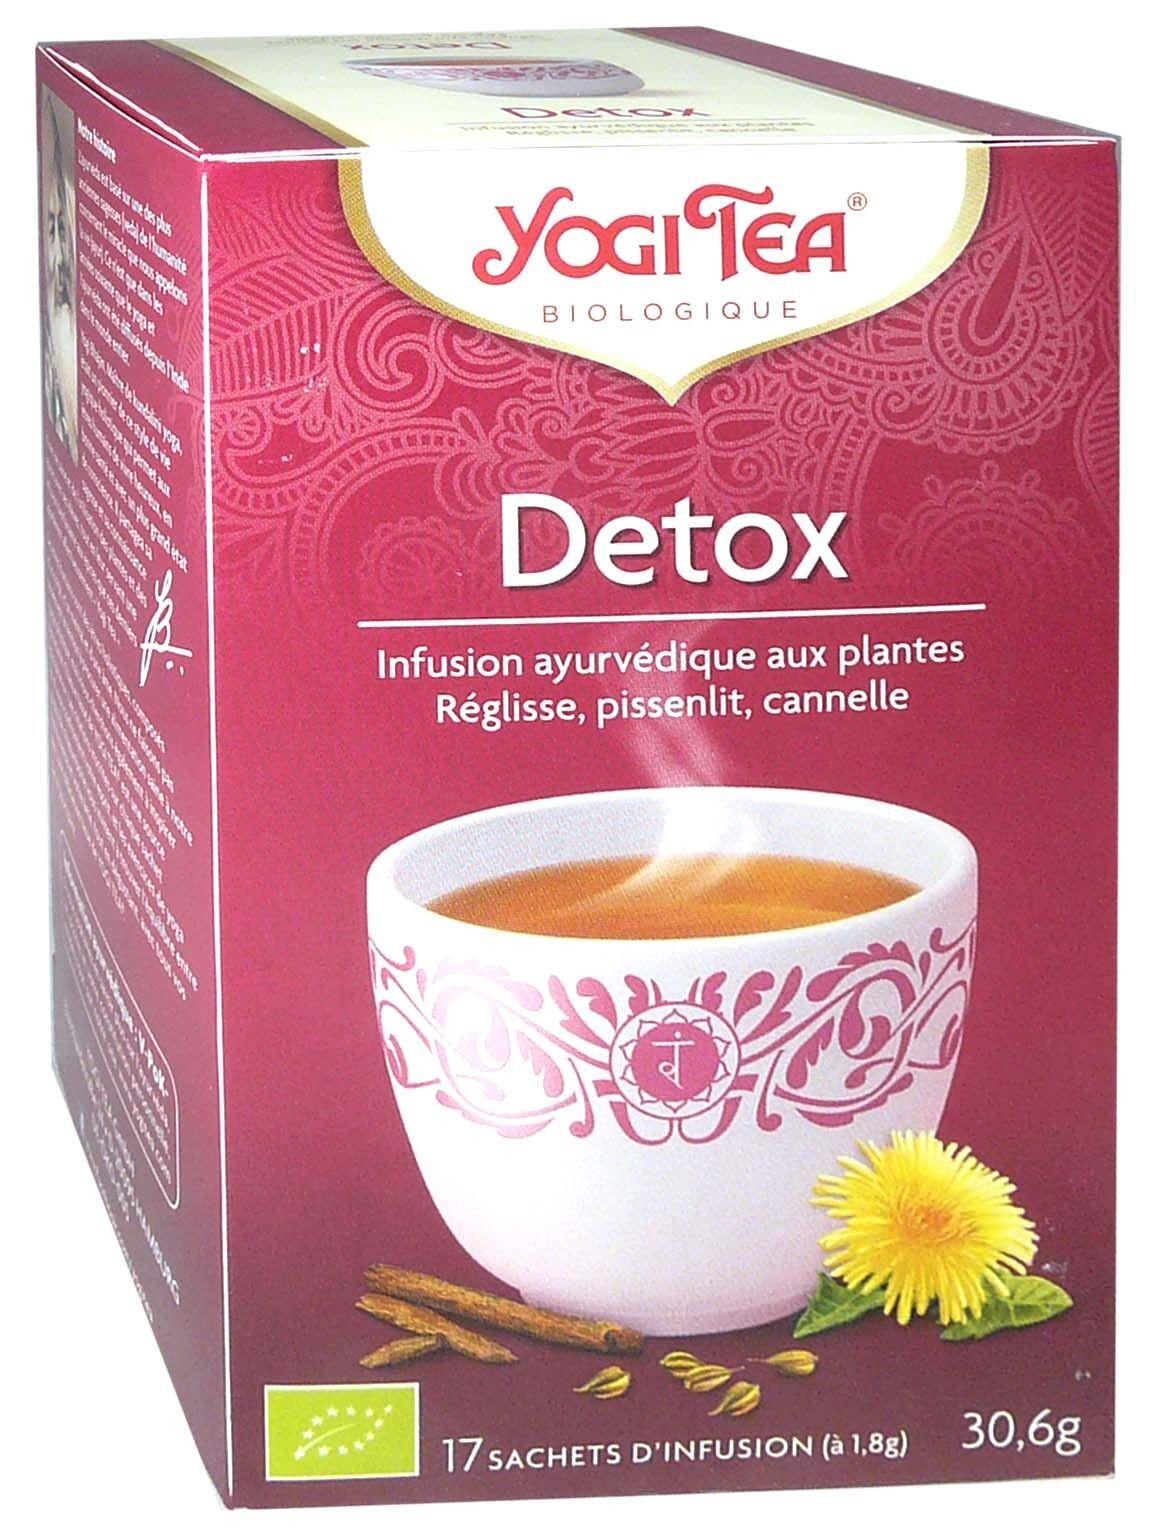 Yogi tea infusion detox x17 sachets